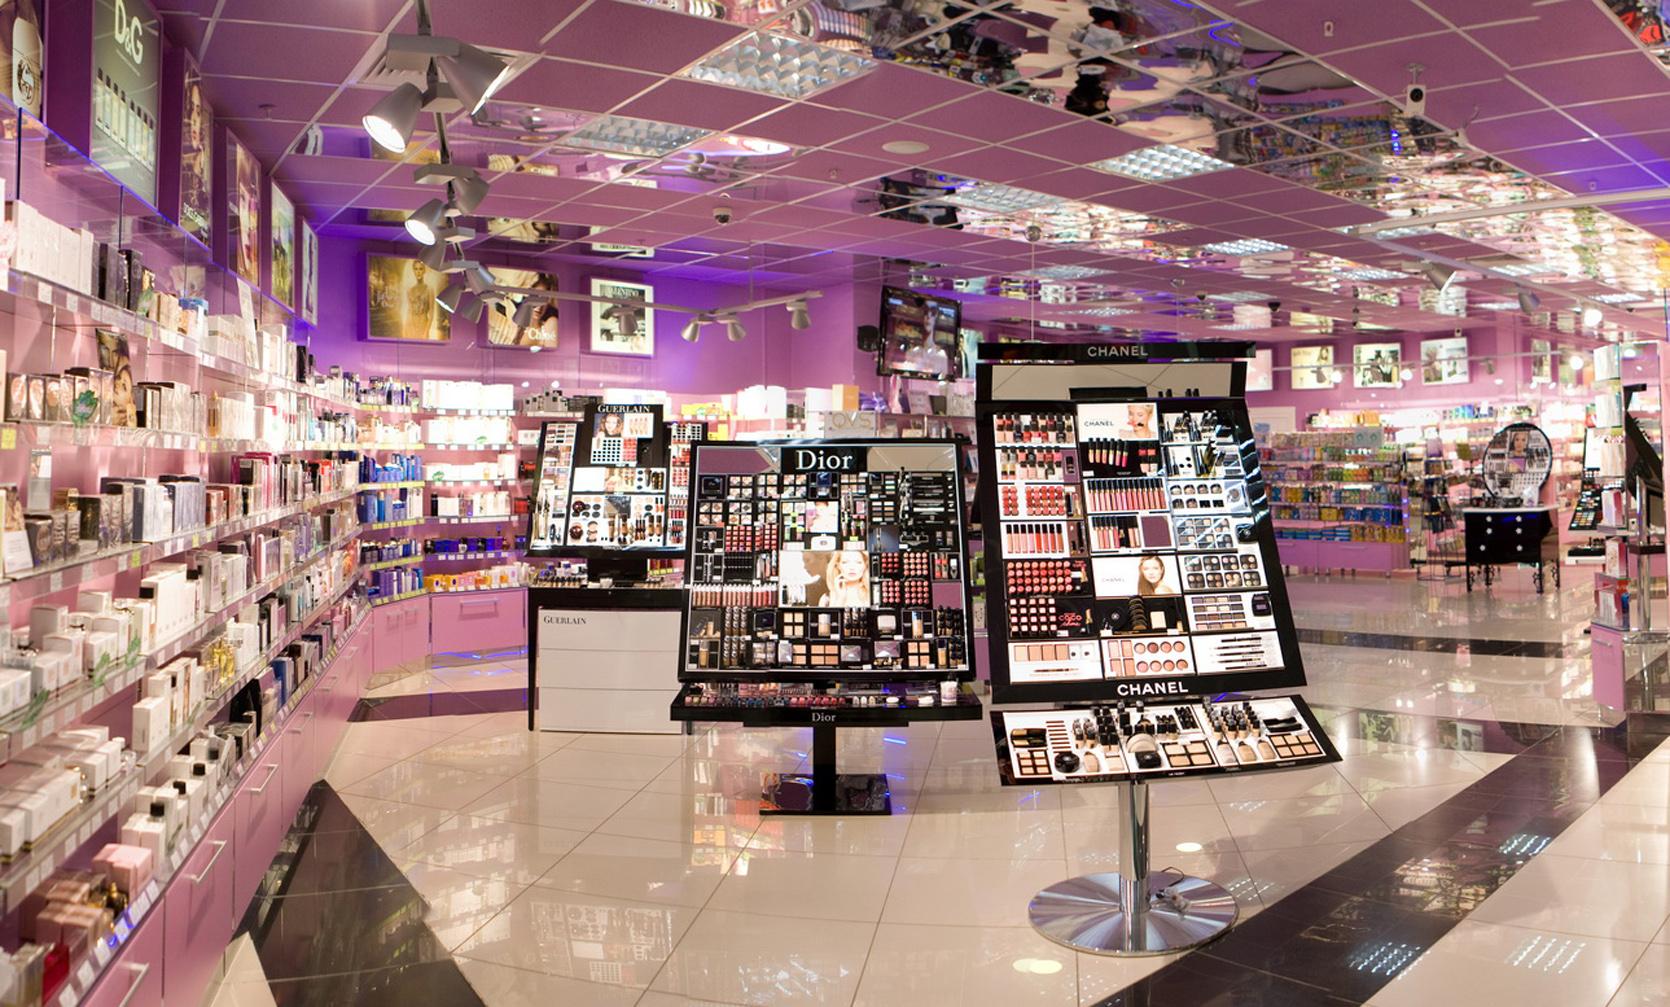 1341816219 img 0628-panorama Пресс-служба сети магазинов элитной парфюмерии  и косметики ... 064328fbf1572